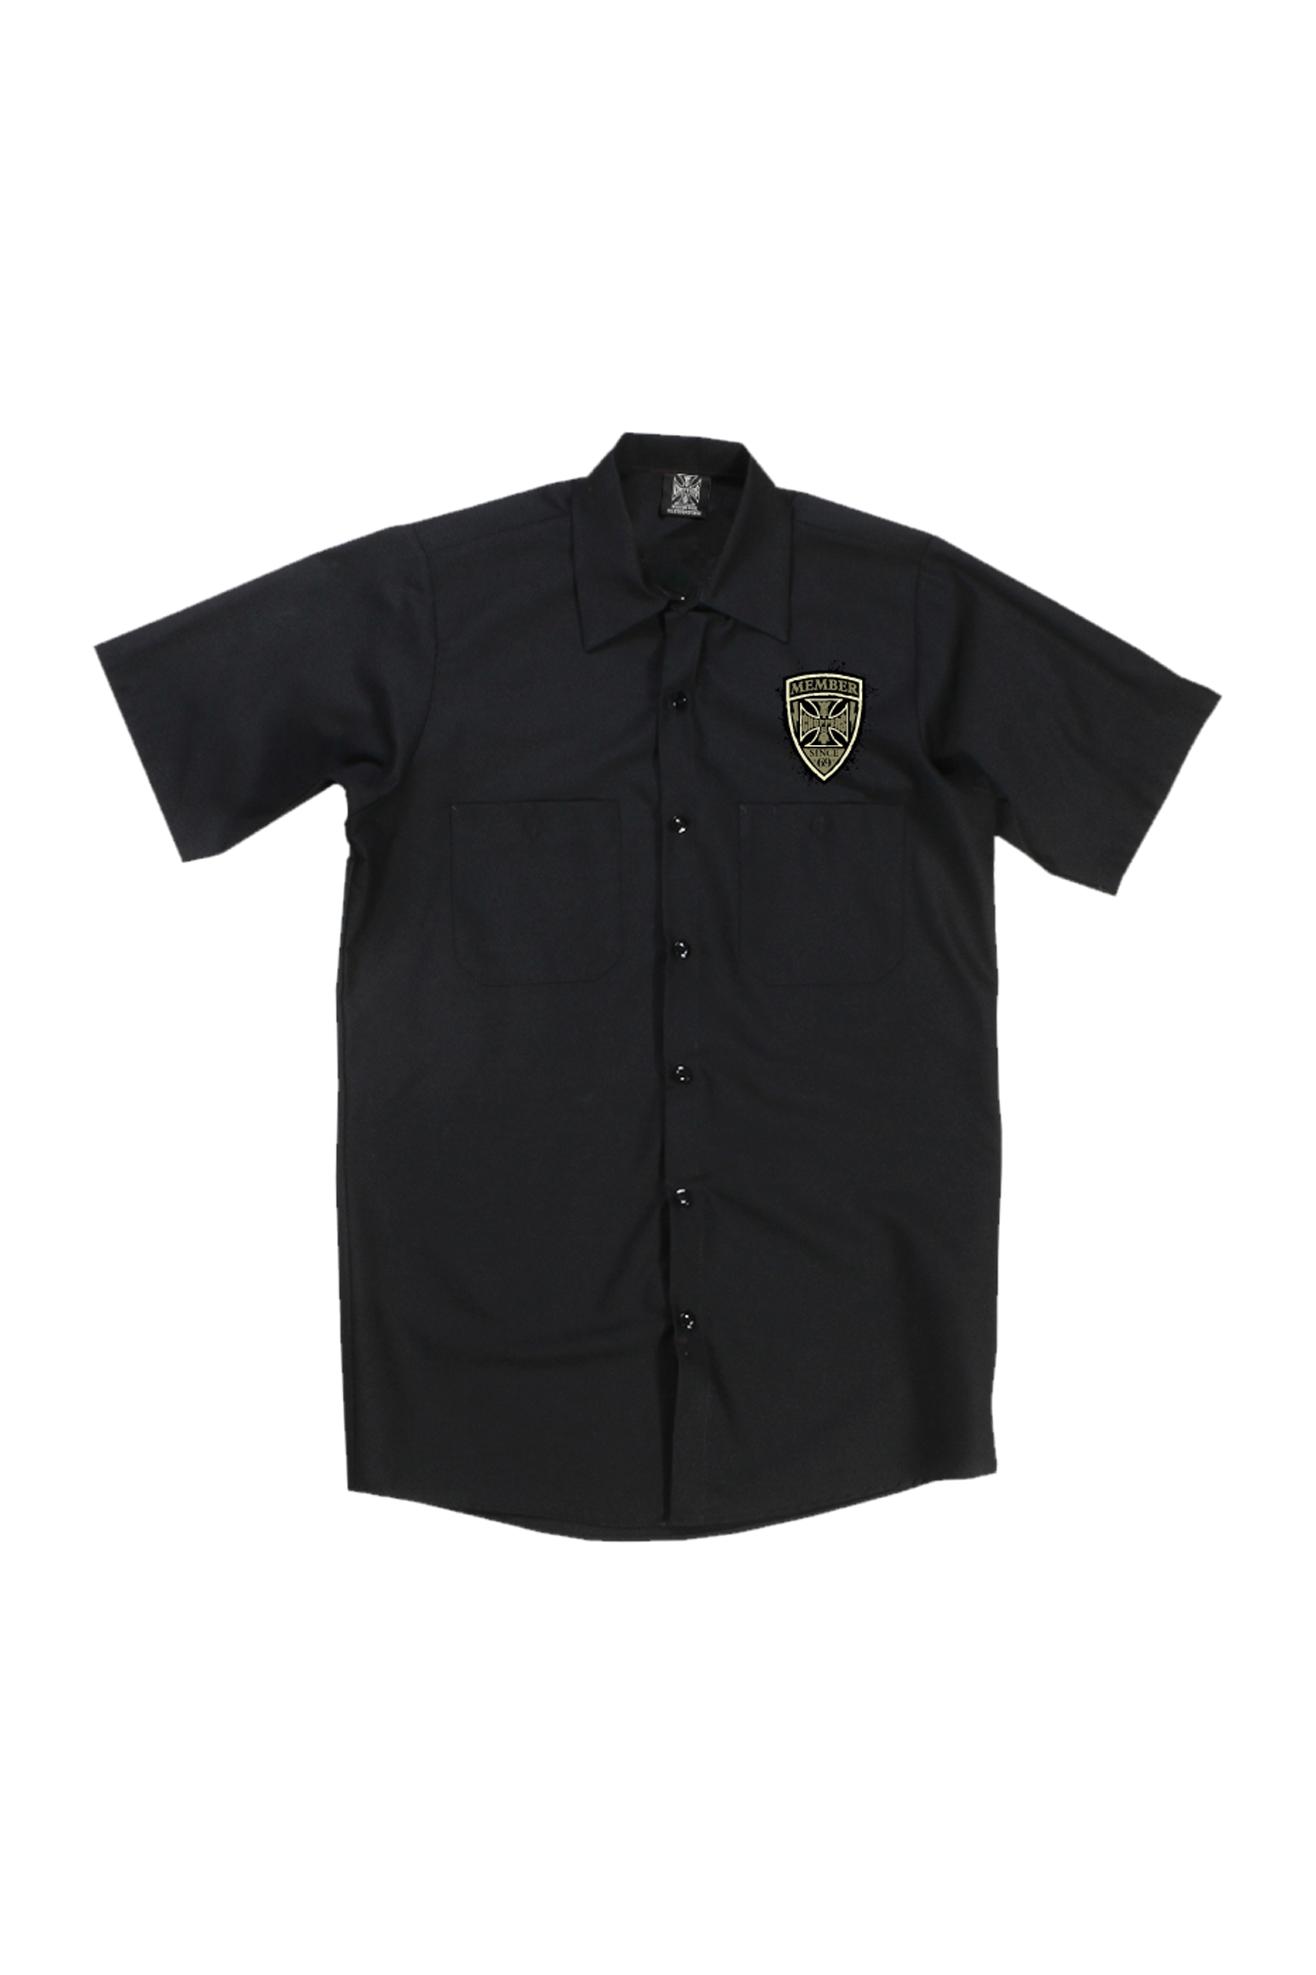 West Coast Choppers Camiseta de Trabajo  Hell Raisers Negra